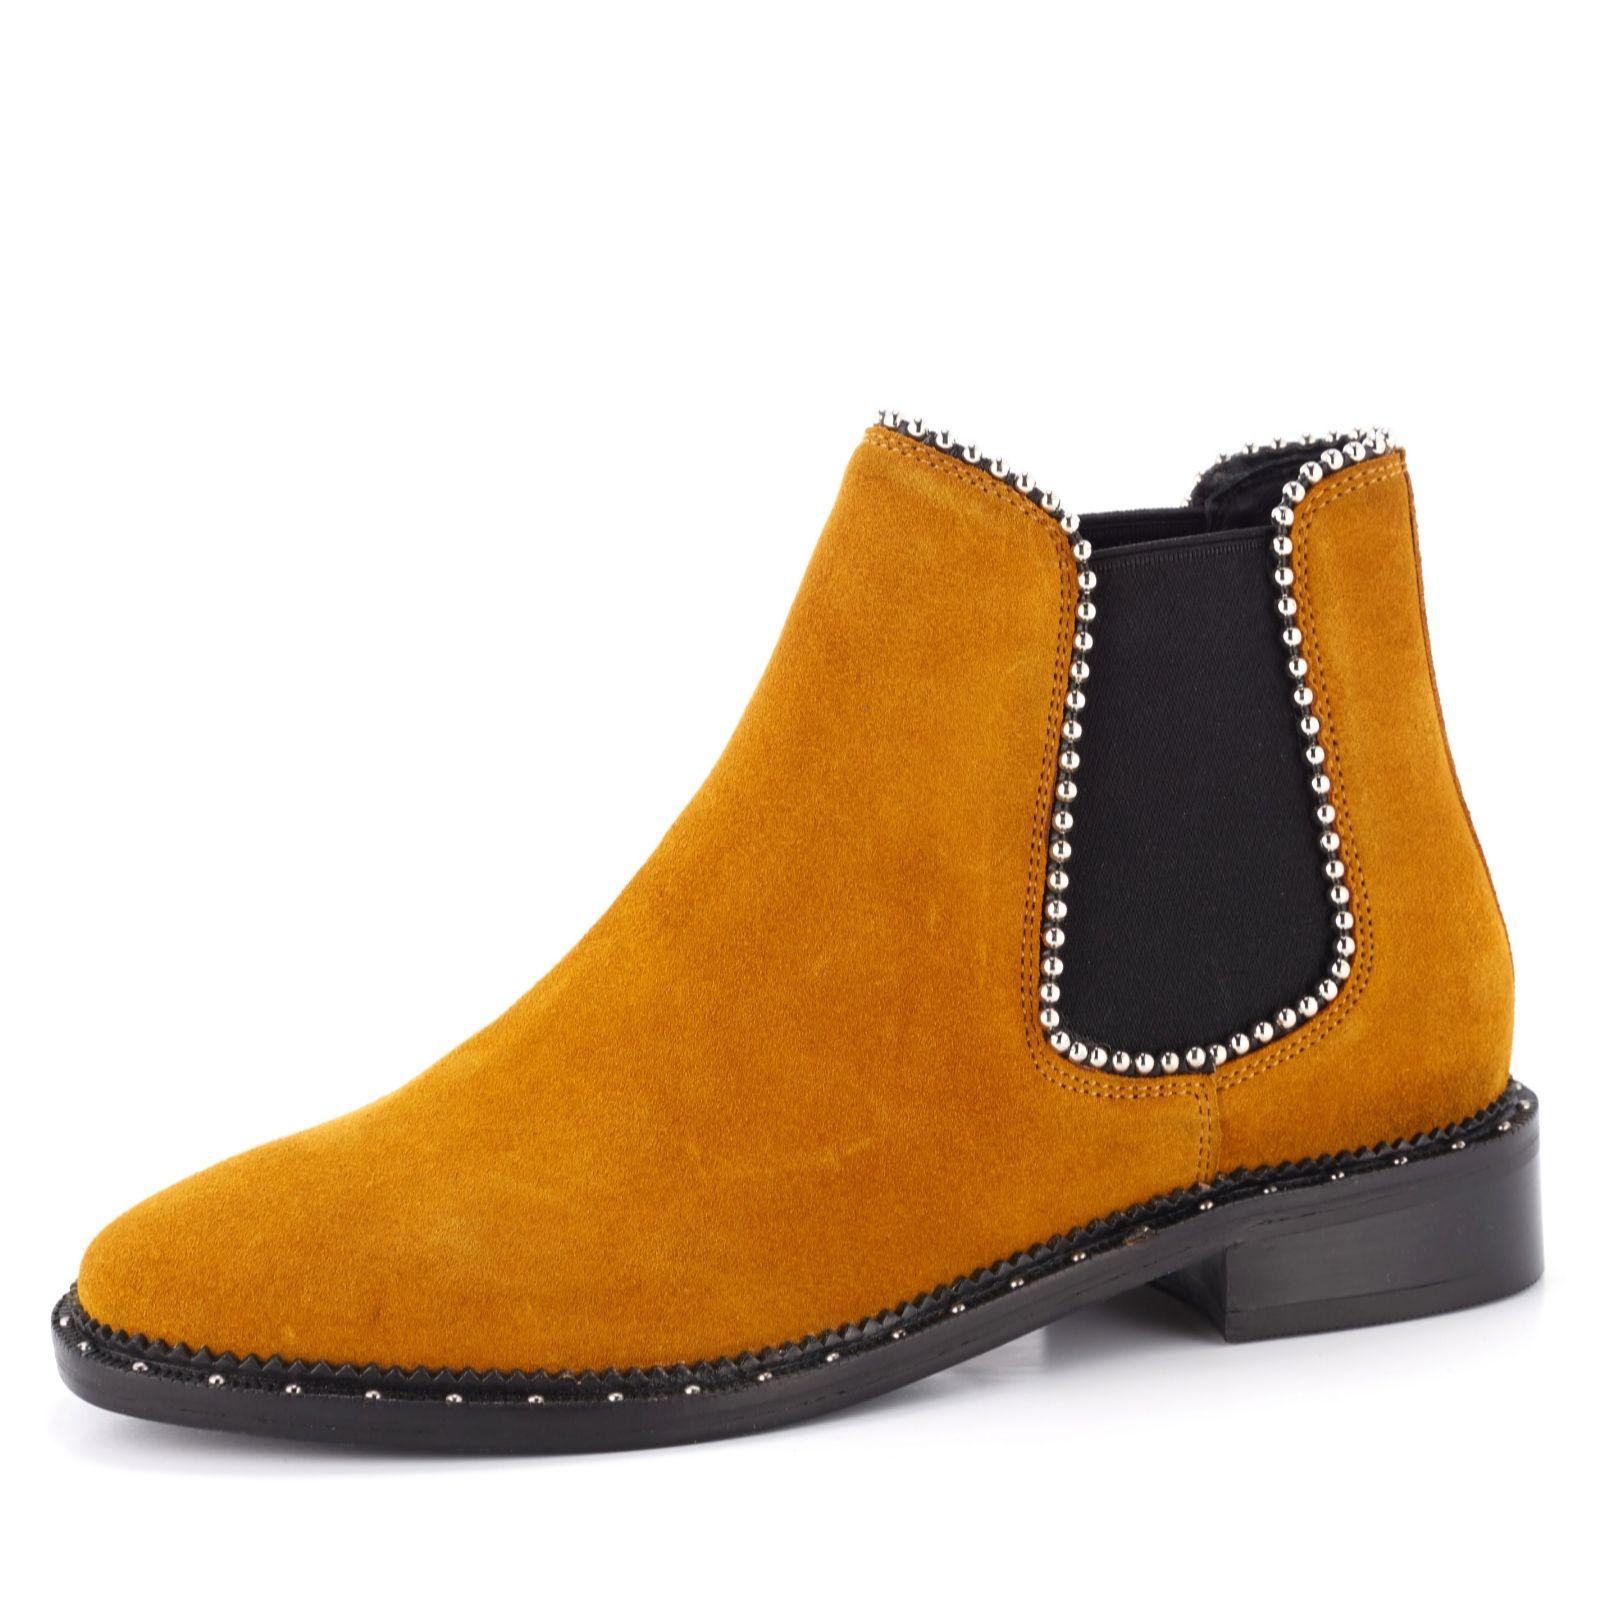 the latest 56cbe 36642 Bronx Studded Chelsea Boot - QVC UK